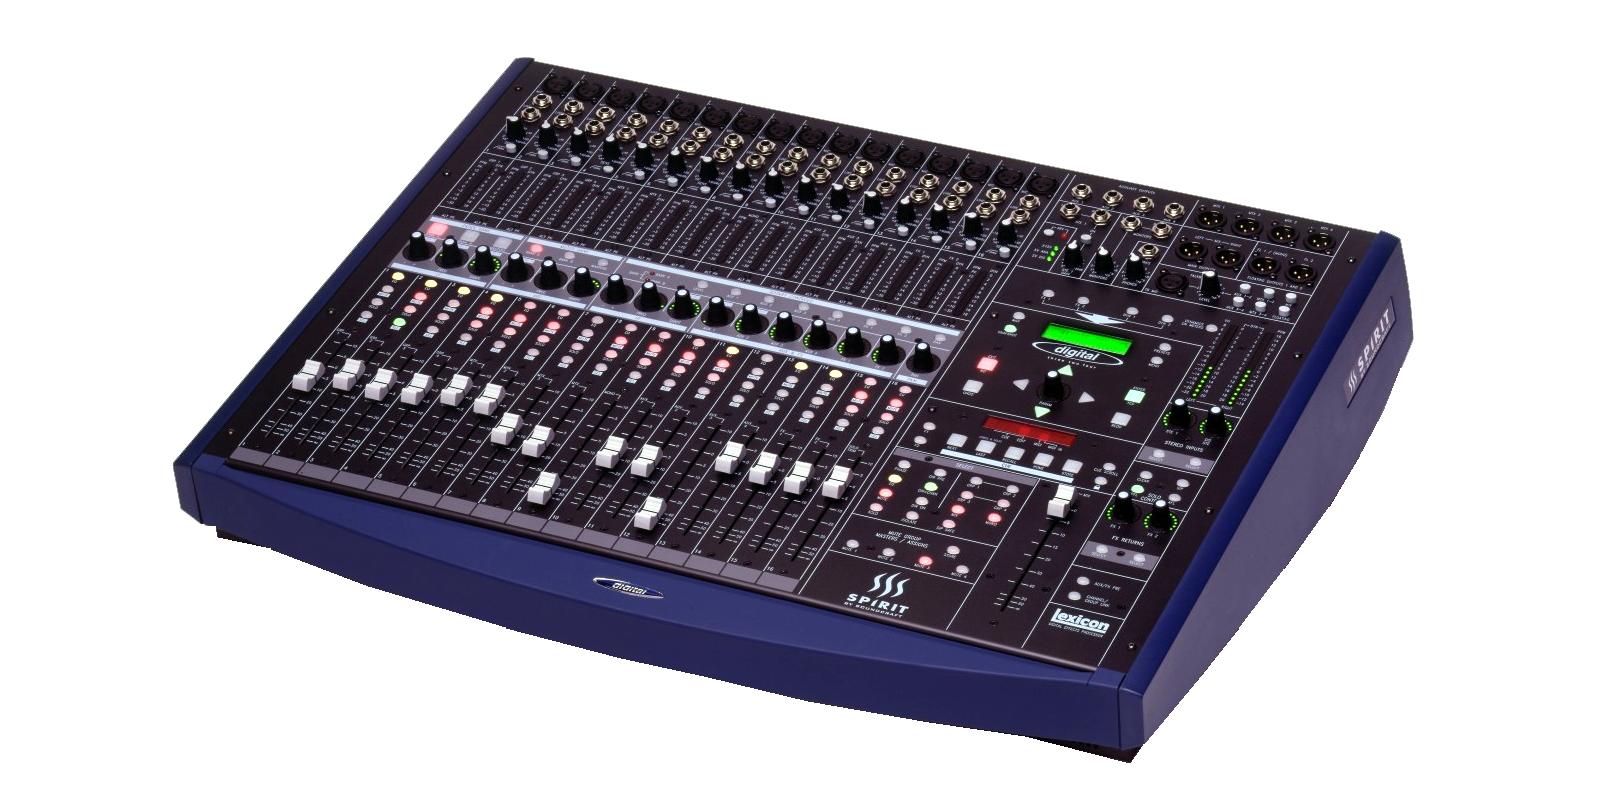 324 live soundcraft professional audio mixers rh soundcraft com Soundcraft Spirit Live 4 2 Live with Randy California Spirit